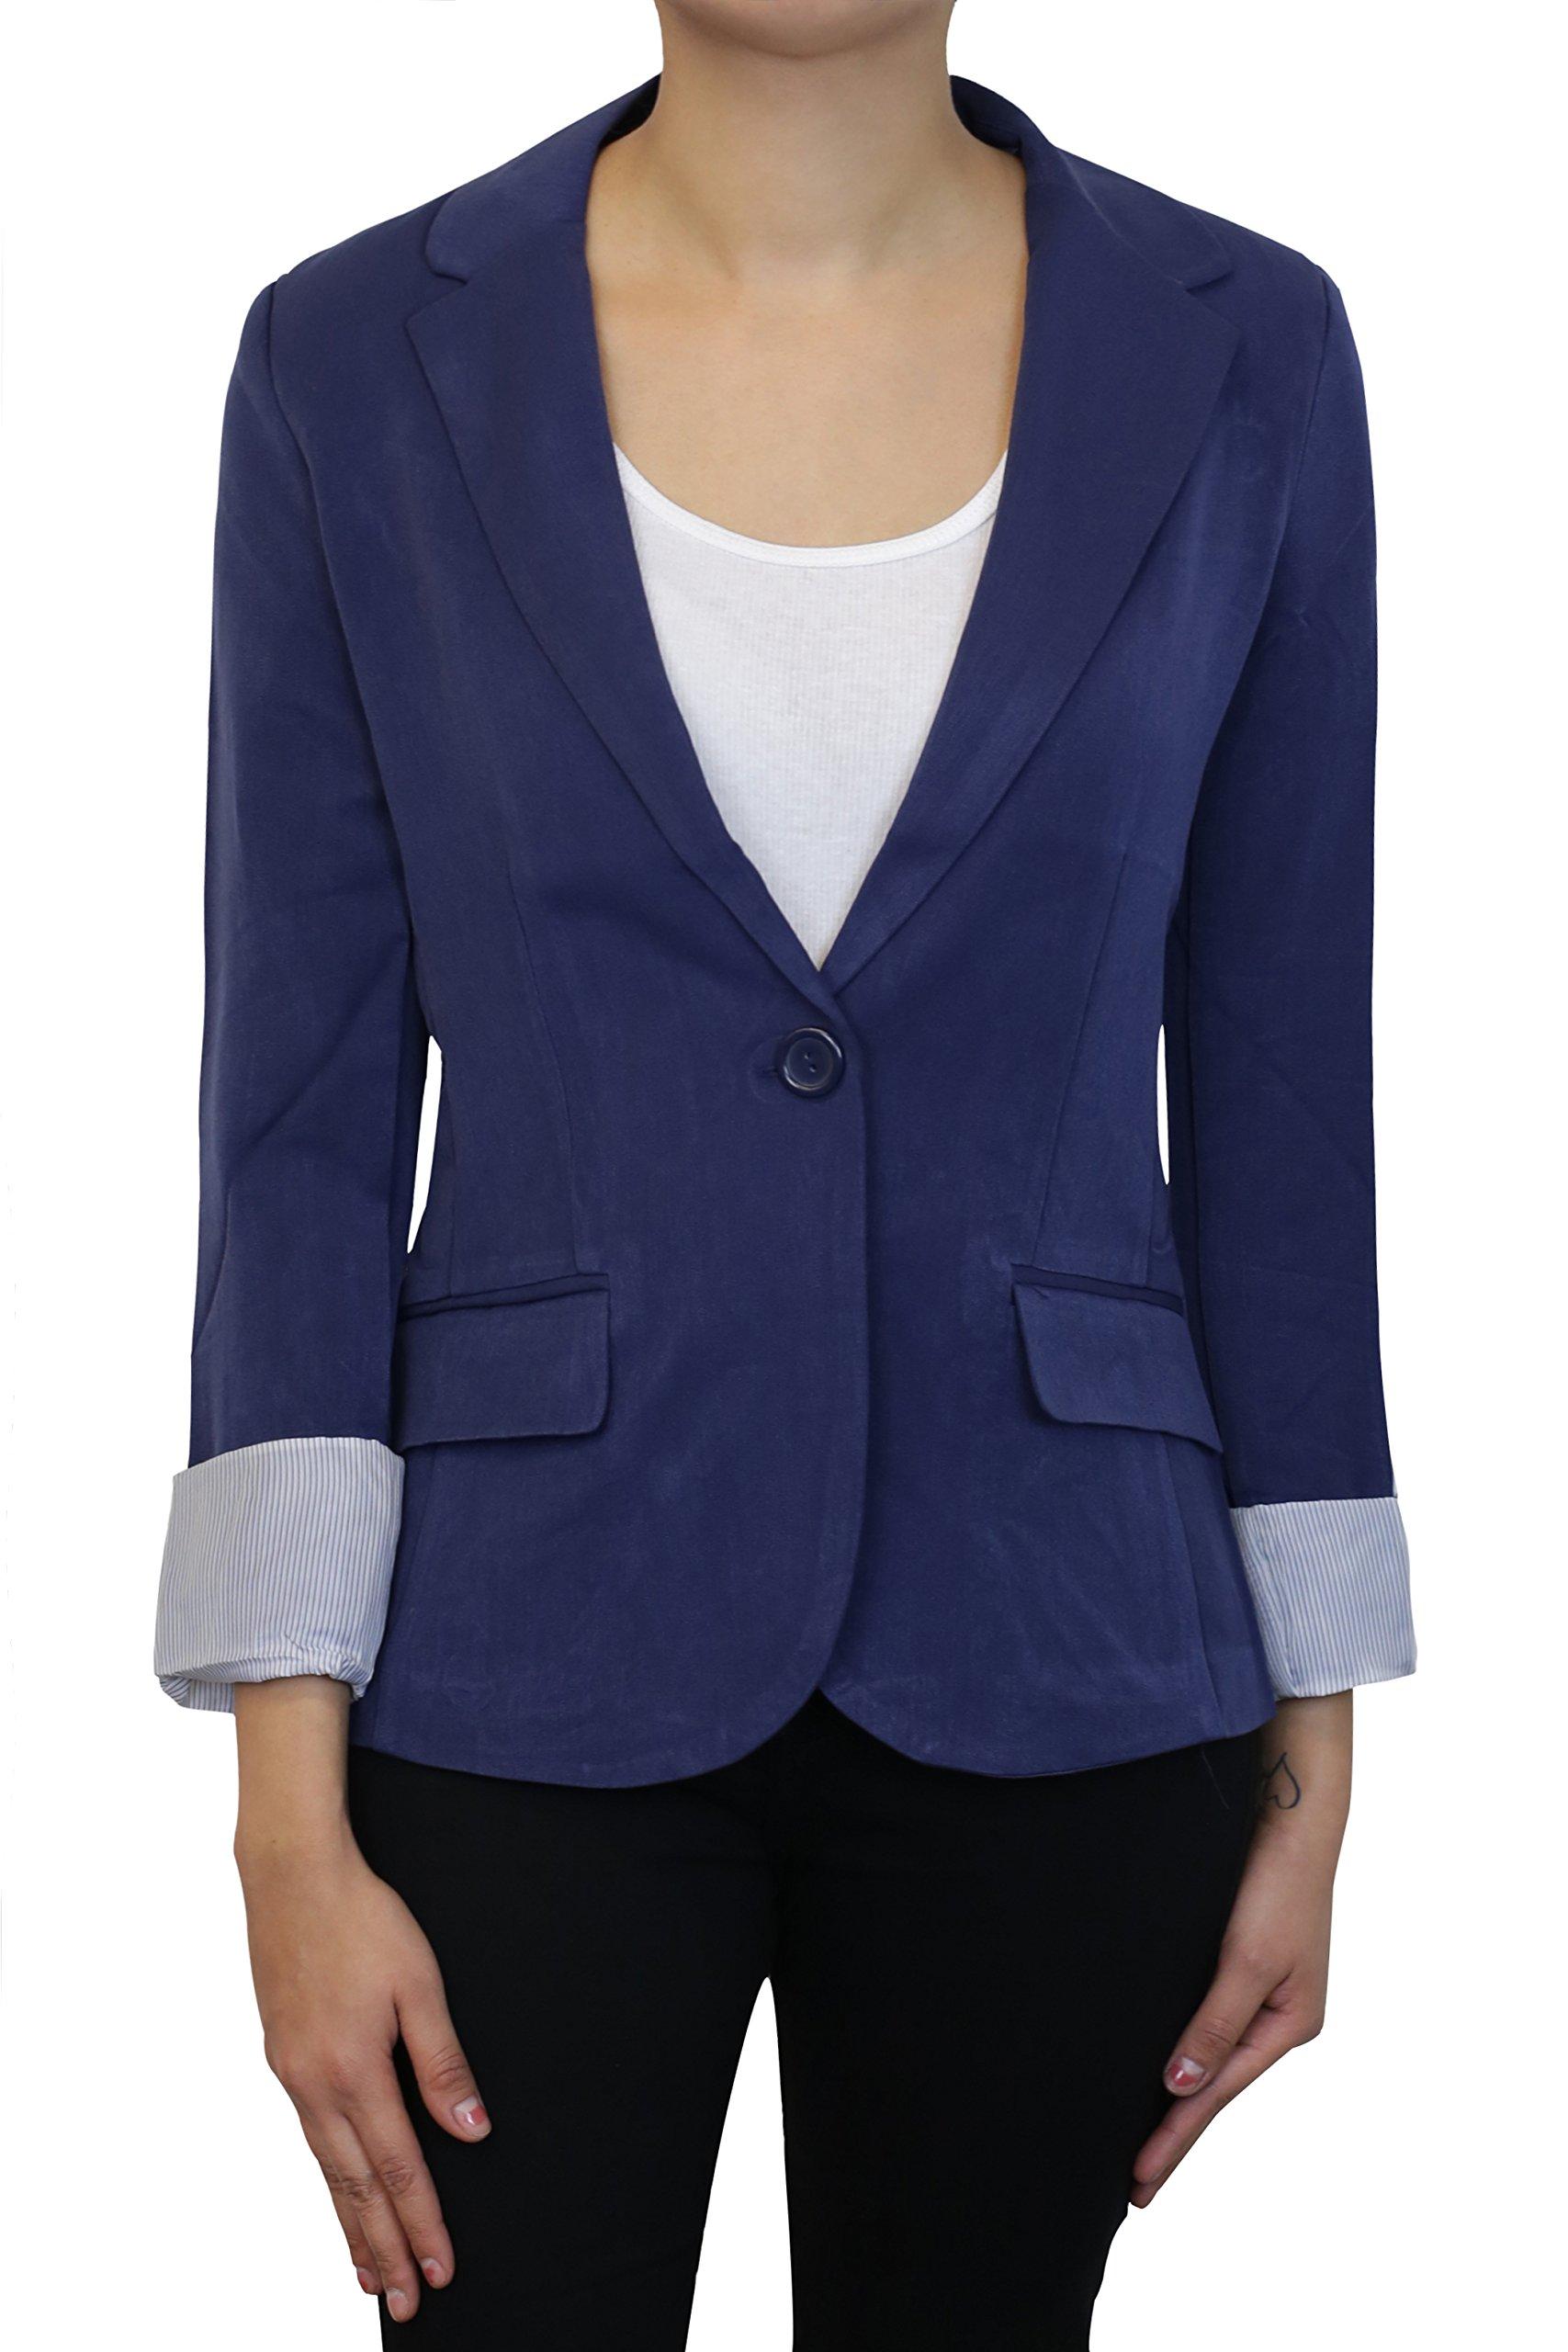 Instar Mode Women's Versatile Business Attire Blazers in Varies Styles (B22117 Navy, Medium)